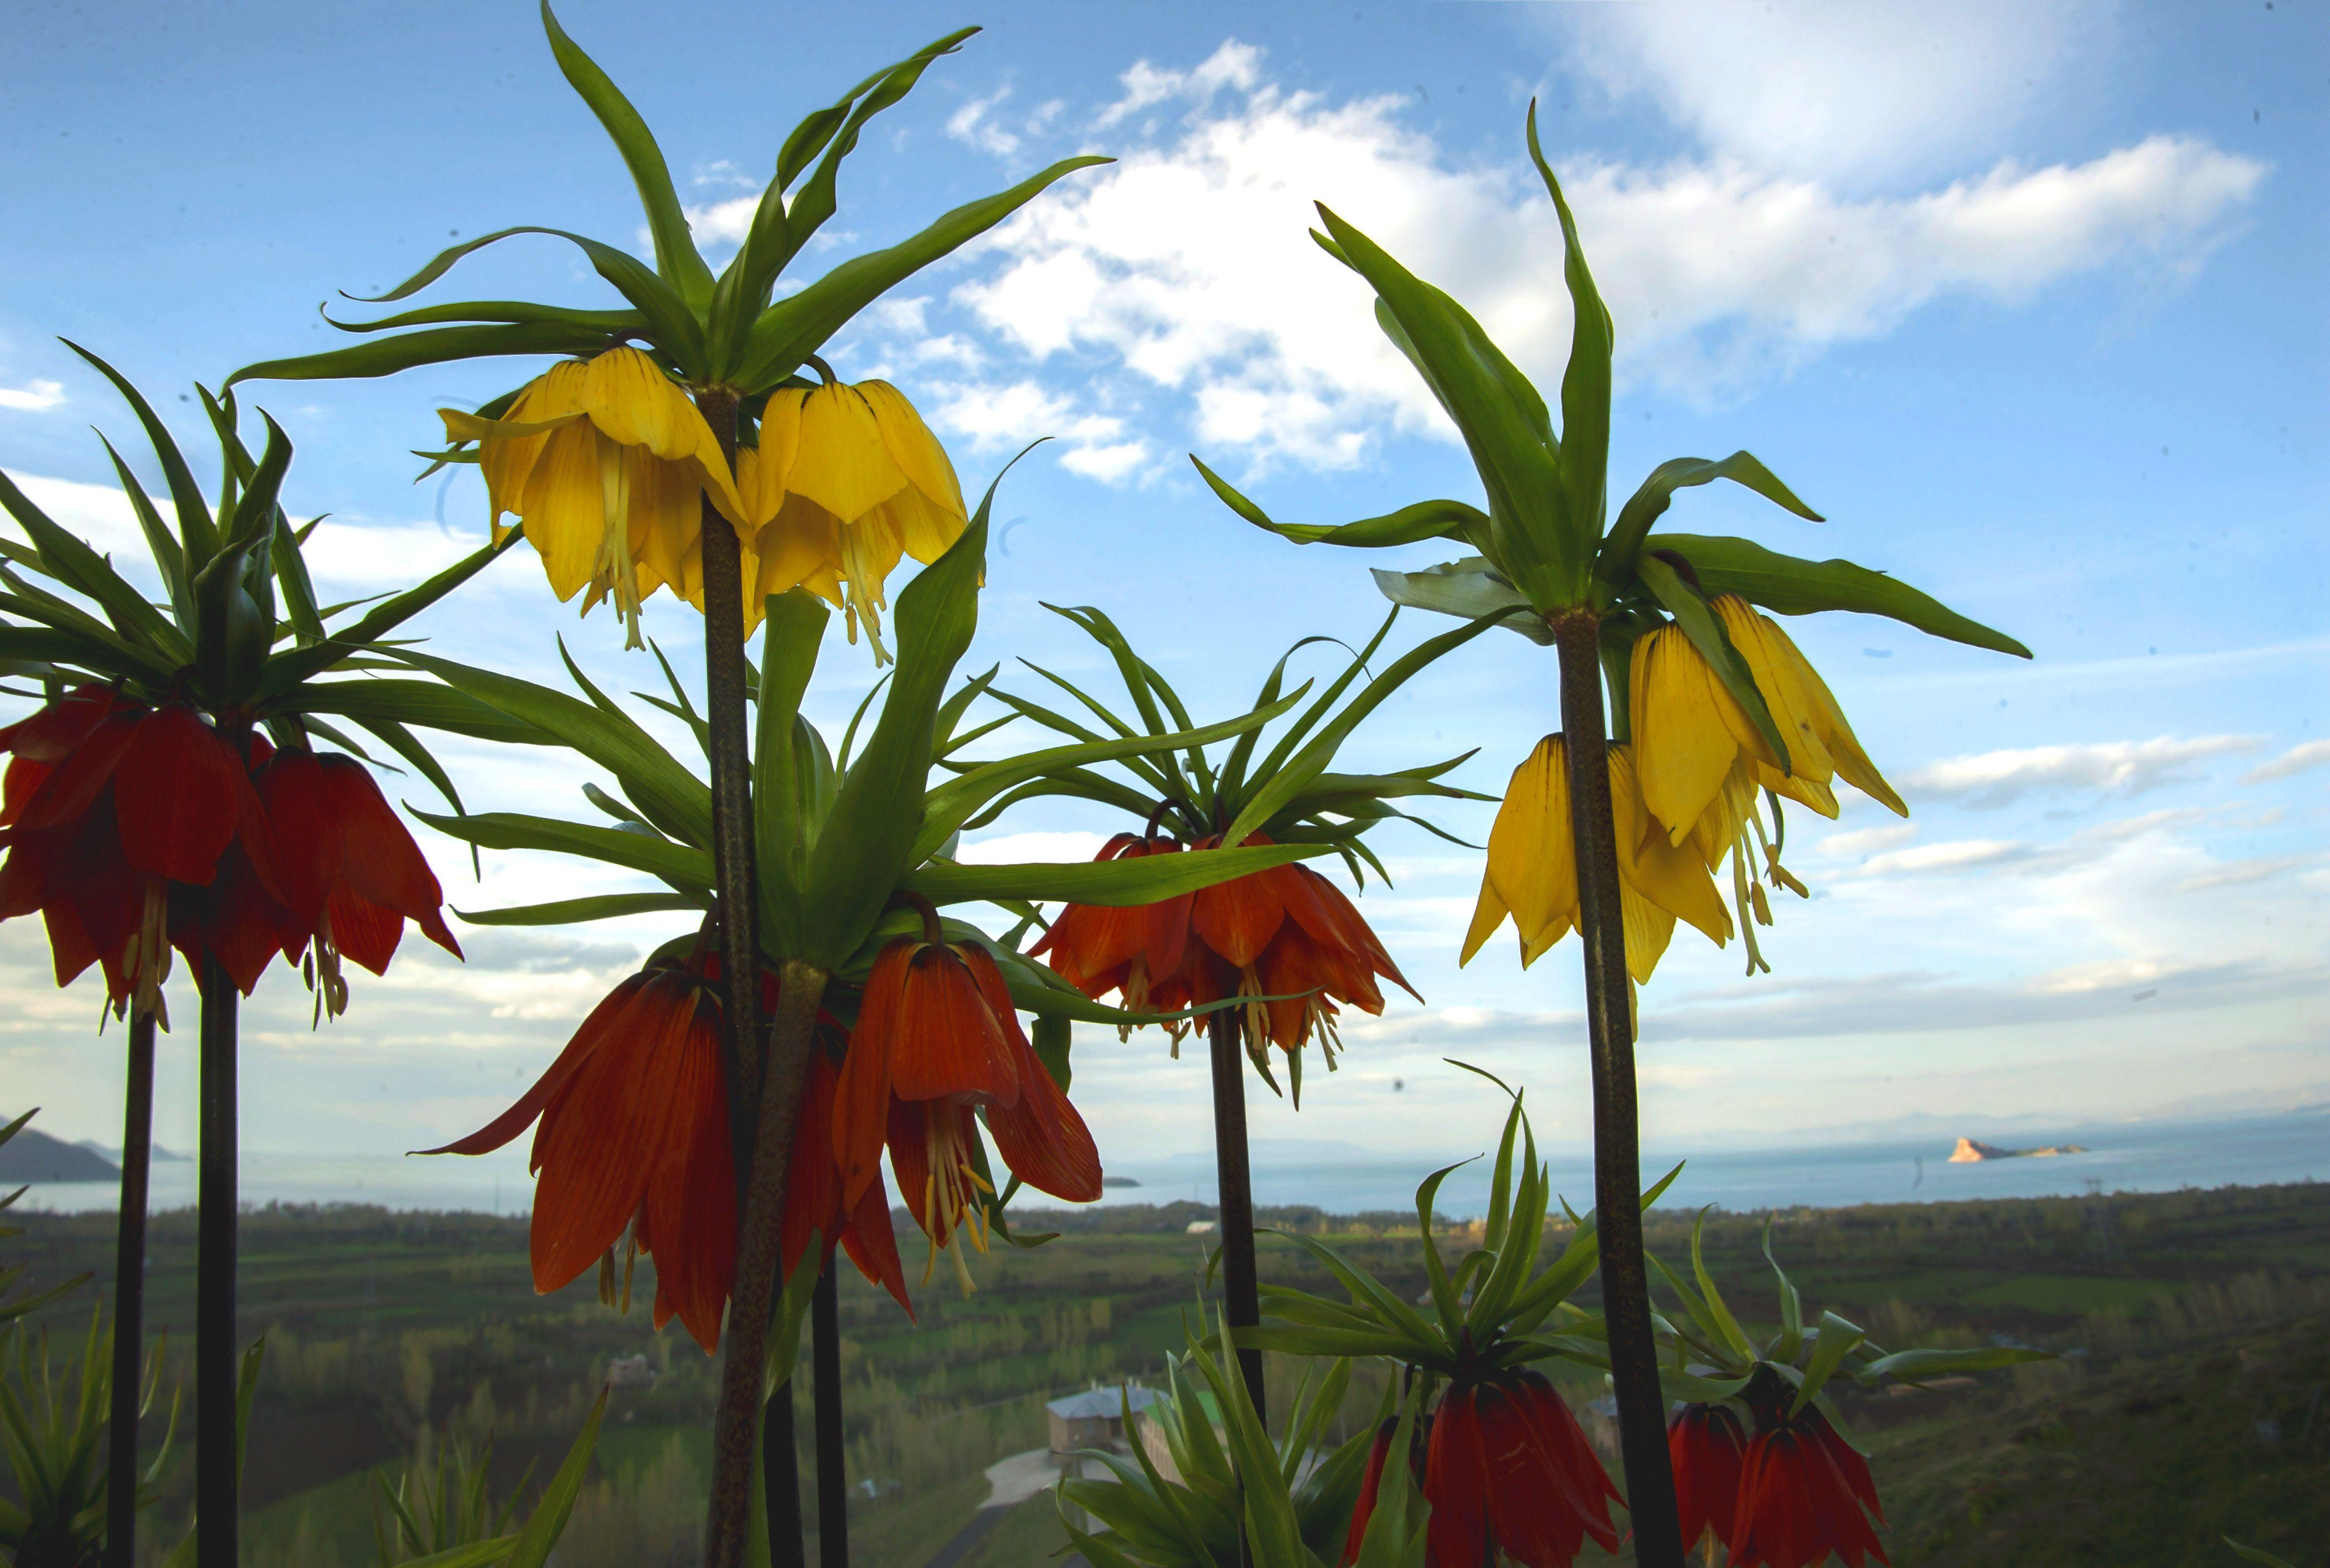 Ters Lale 2020 Laleler Cicek Tulip